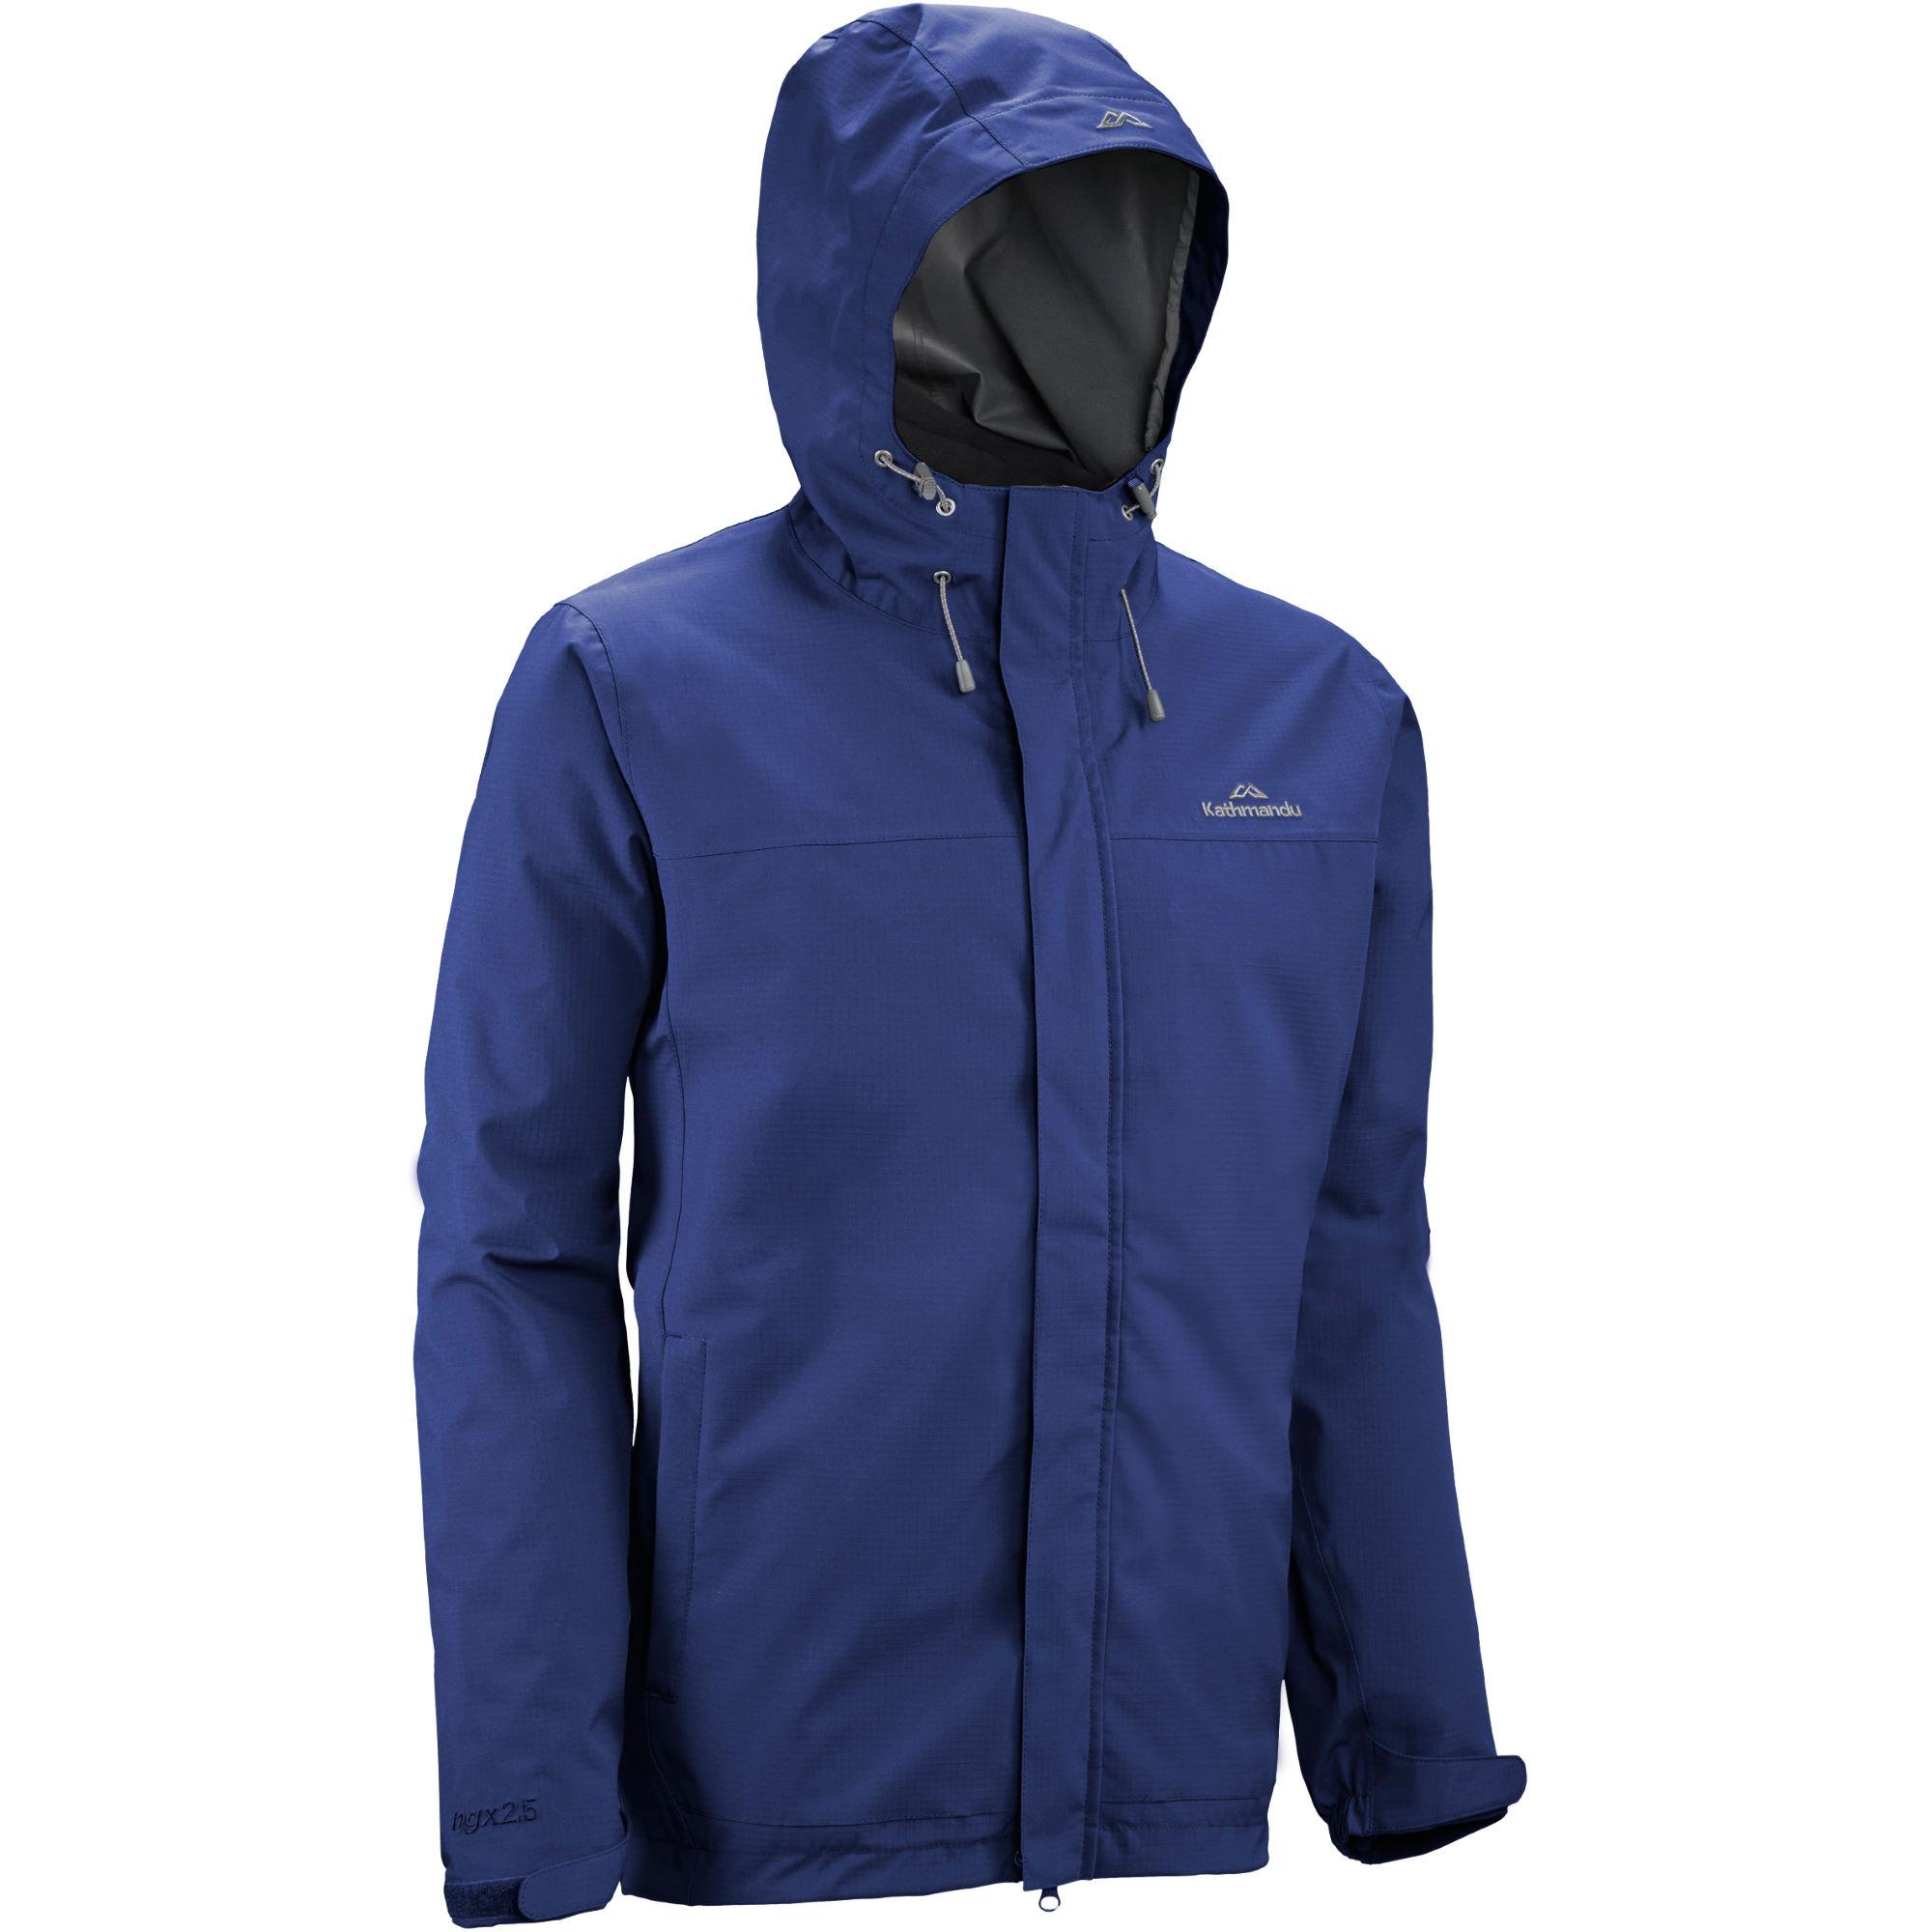 Kathmandu-Monrovia-2-5-Layer-Waterproof-Jacket-v2-Waterproof-Jackets-Marine-AW15-12494-666.jpg